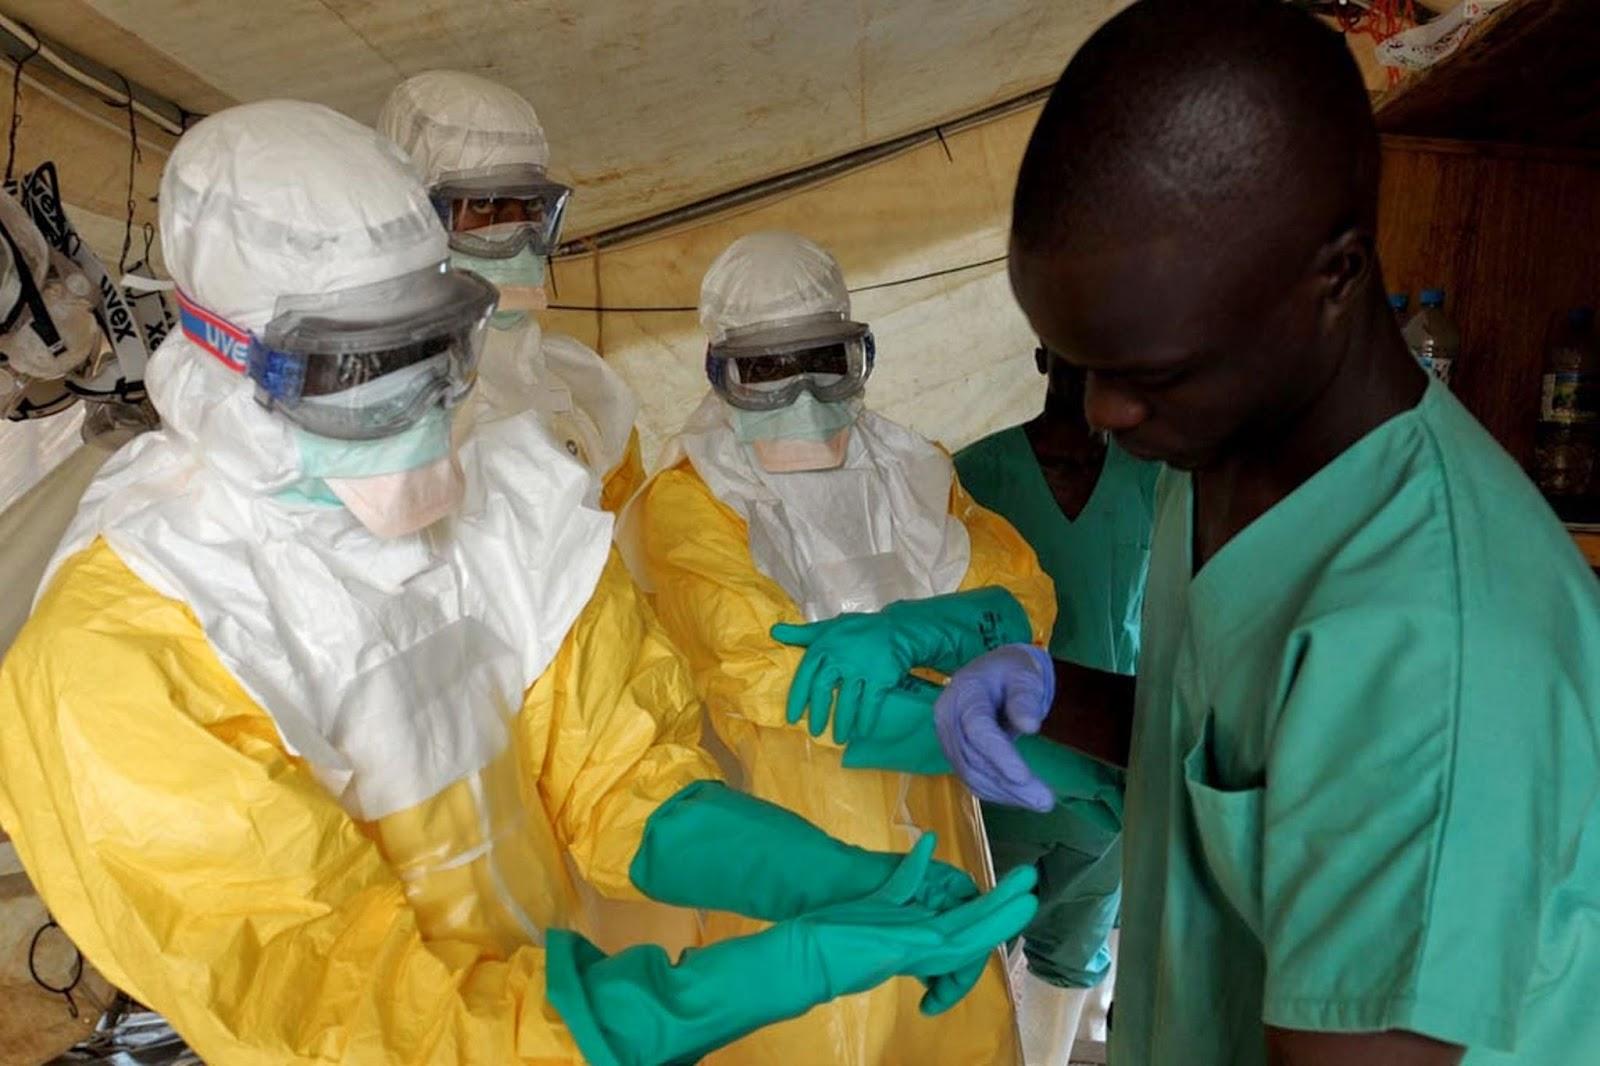 zmapp ebola treatment drug